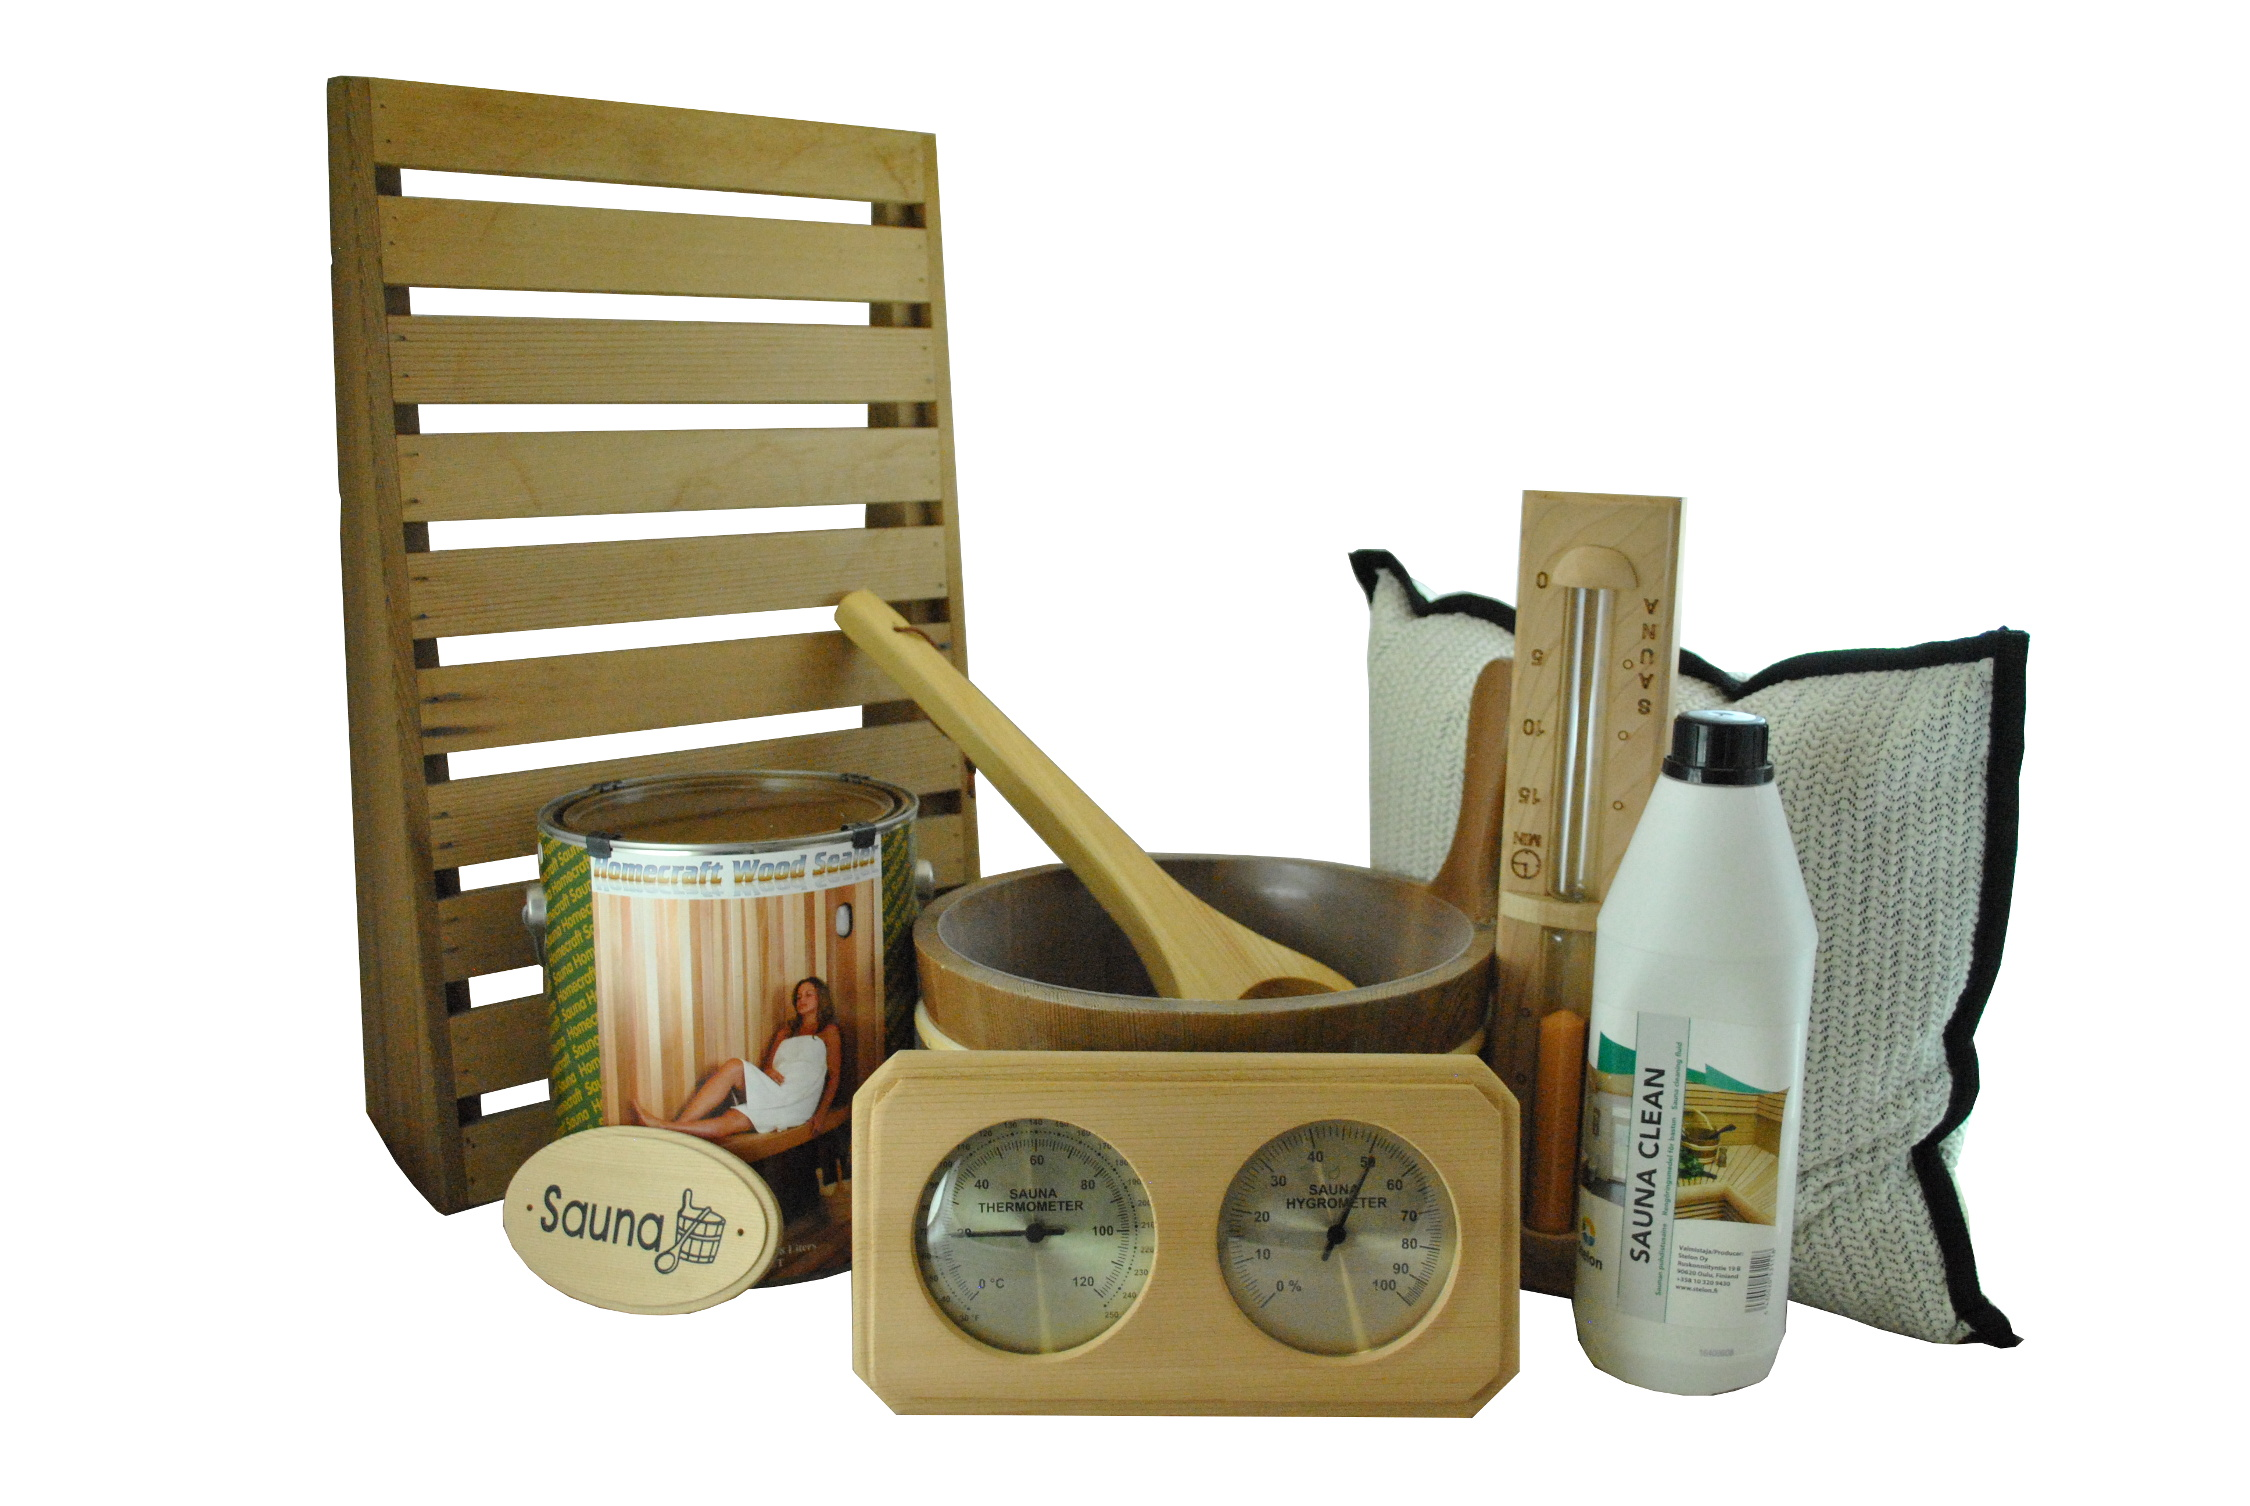 Sauna Accessory Kit